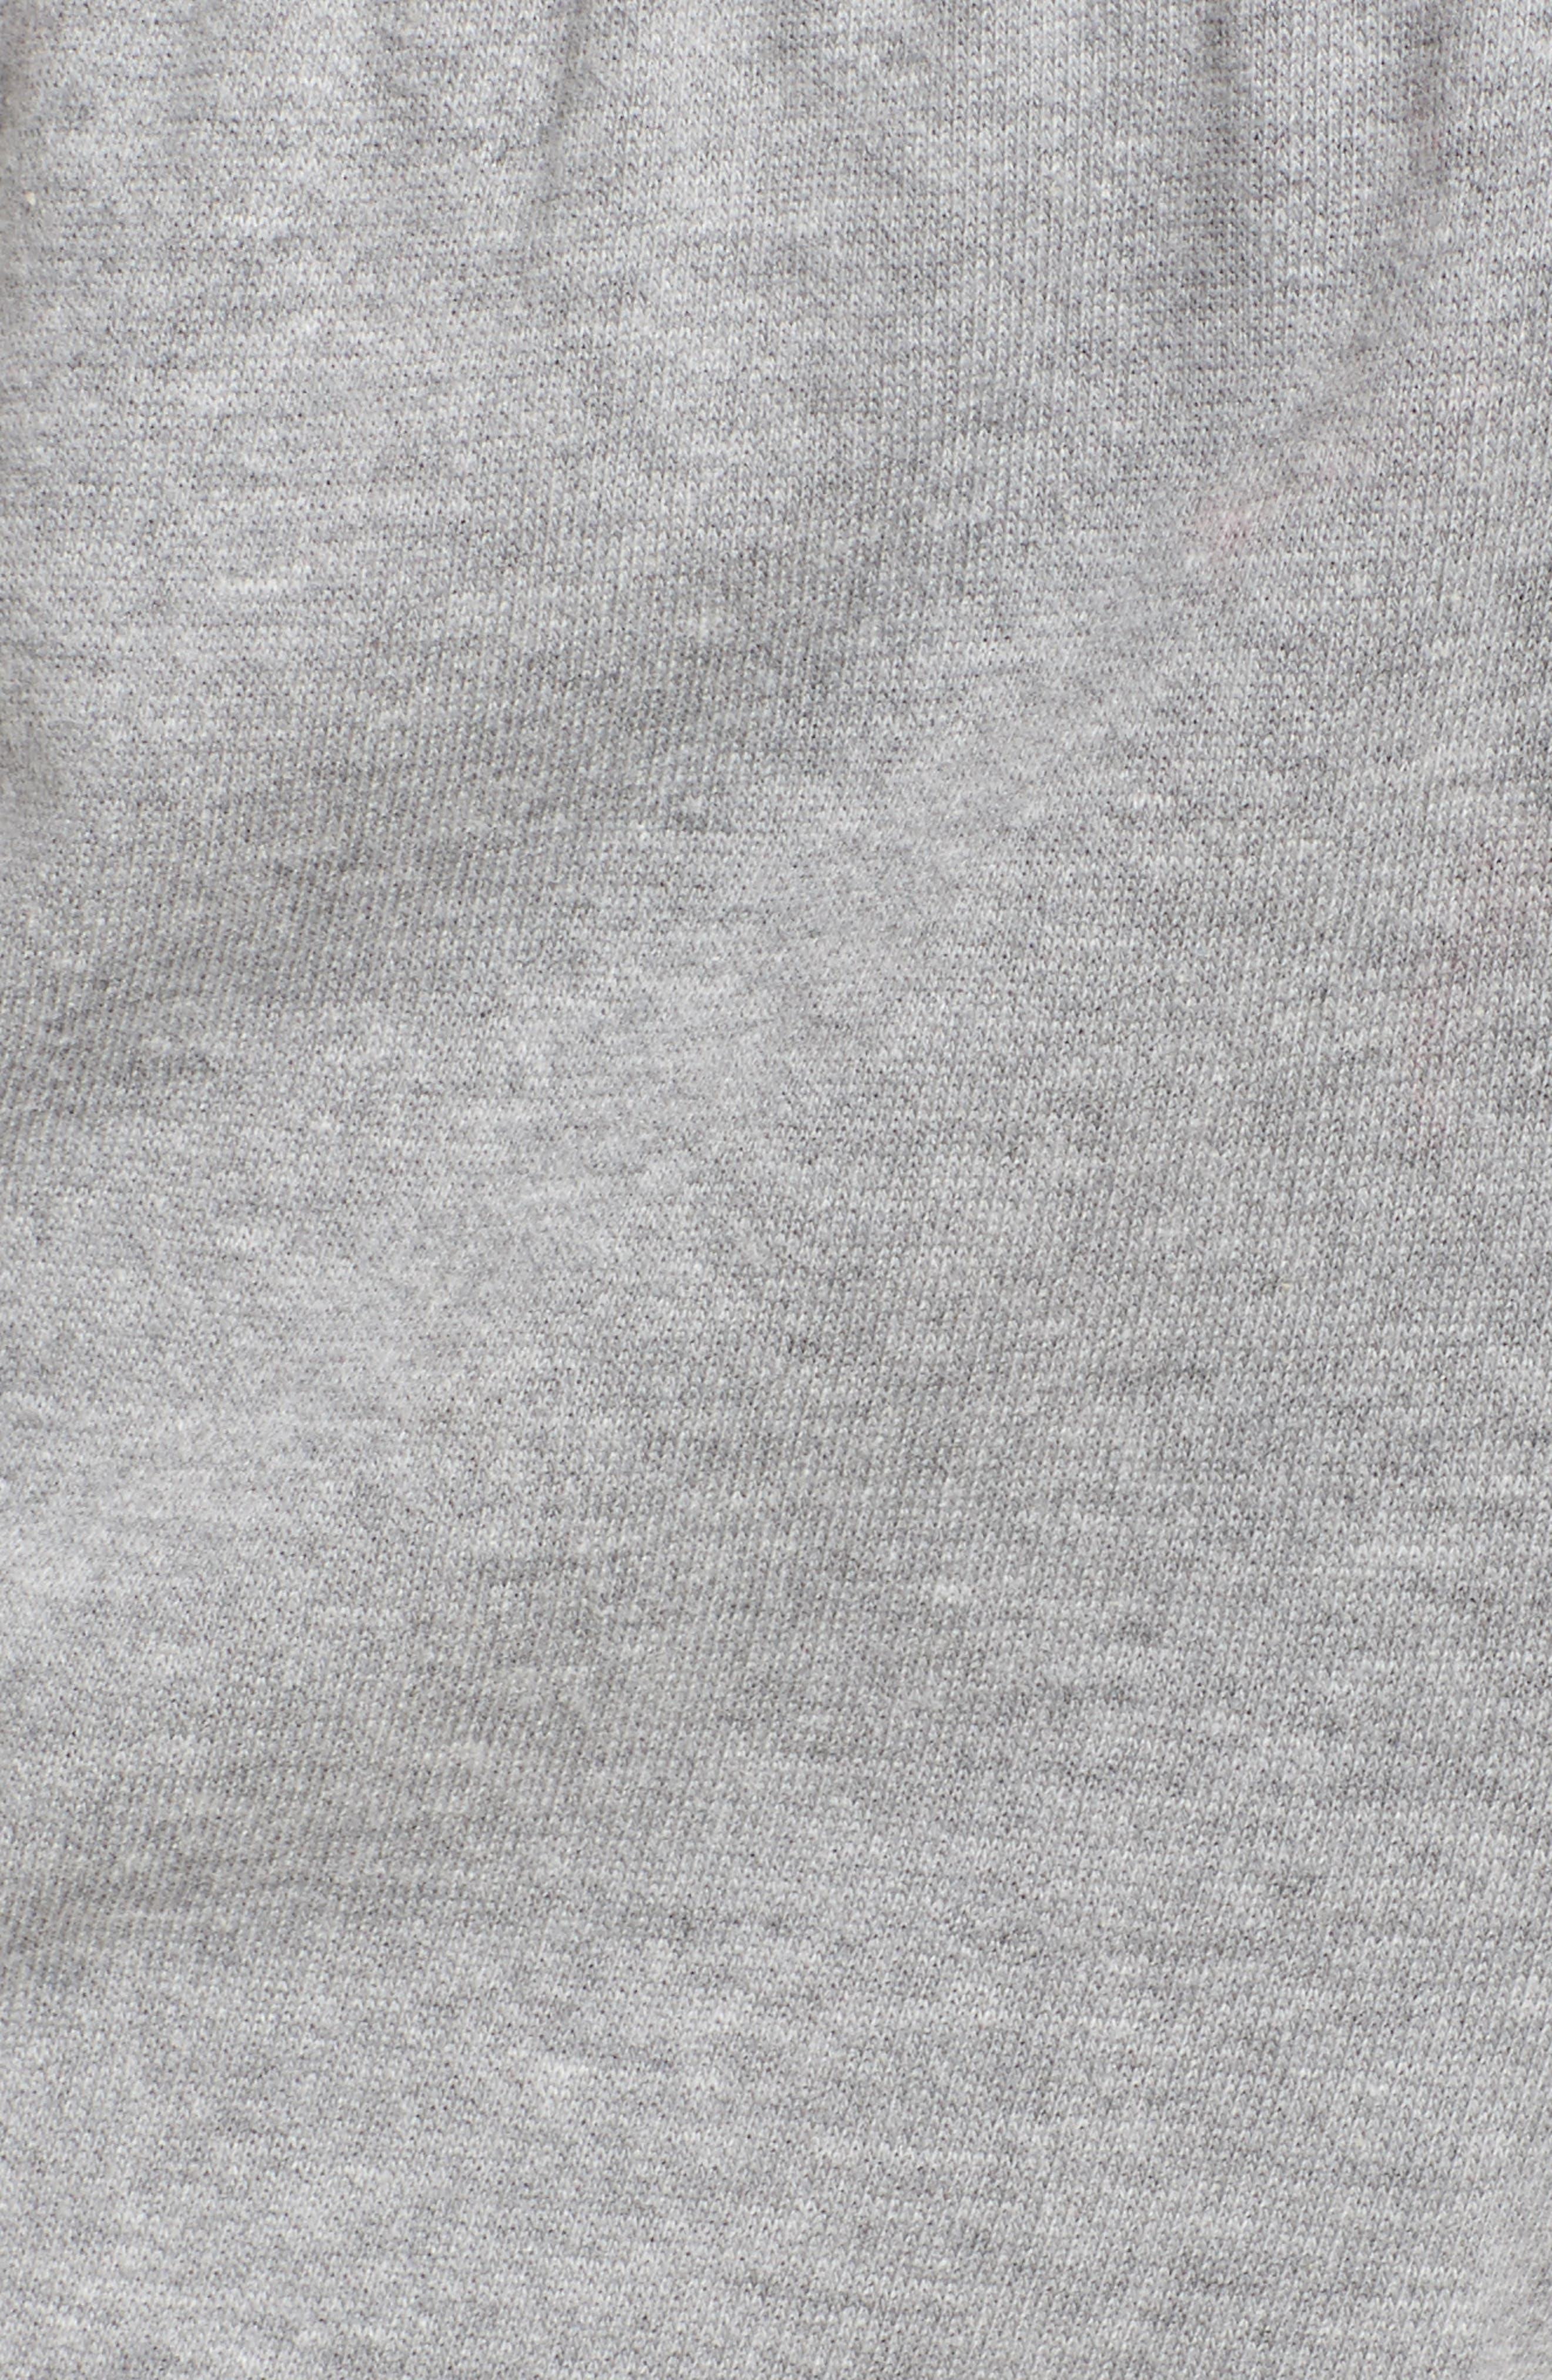 Lounge Shorts,                             Alternate thumbnail 5, color,                             Heather Grey